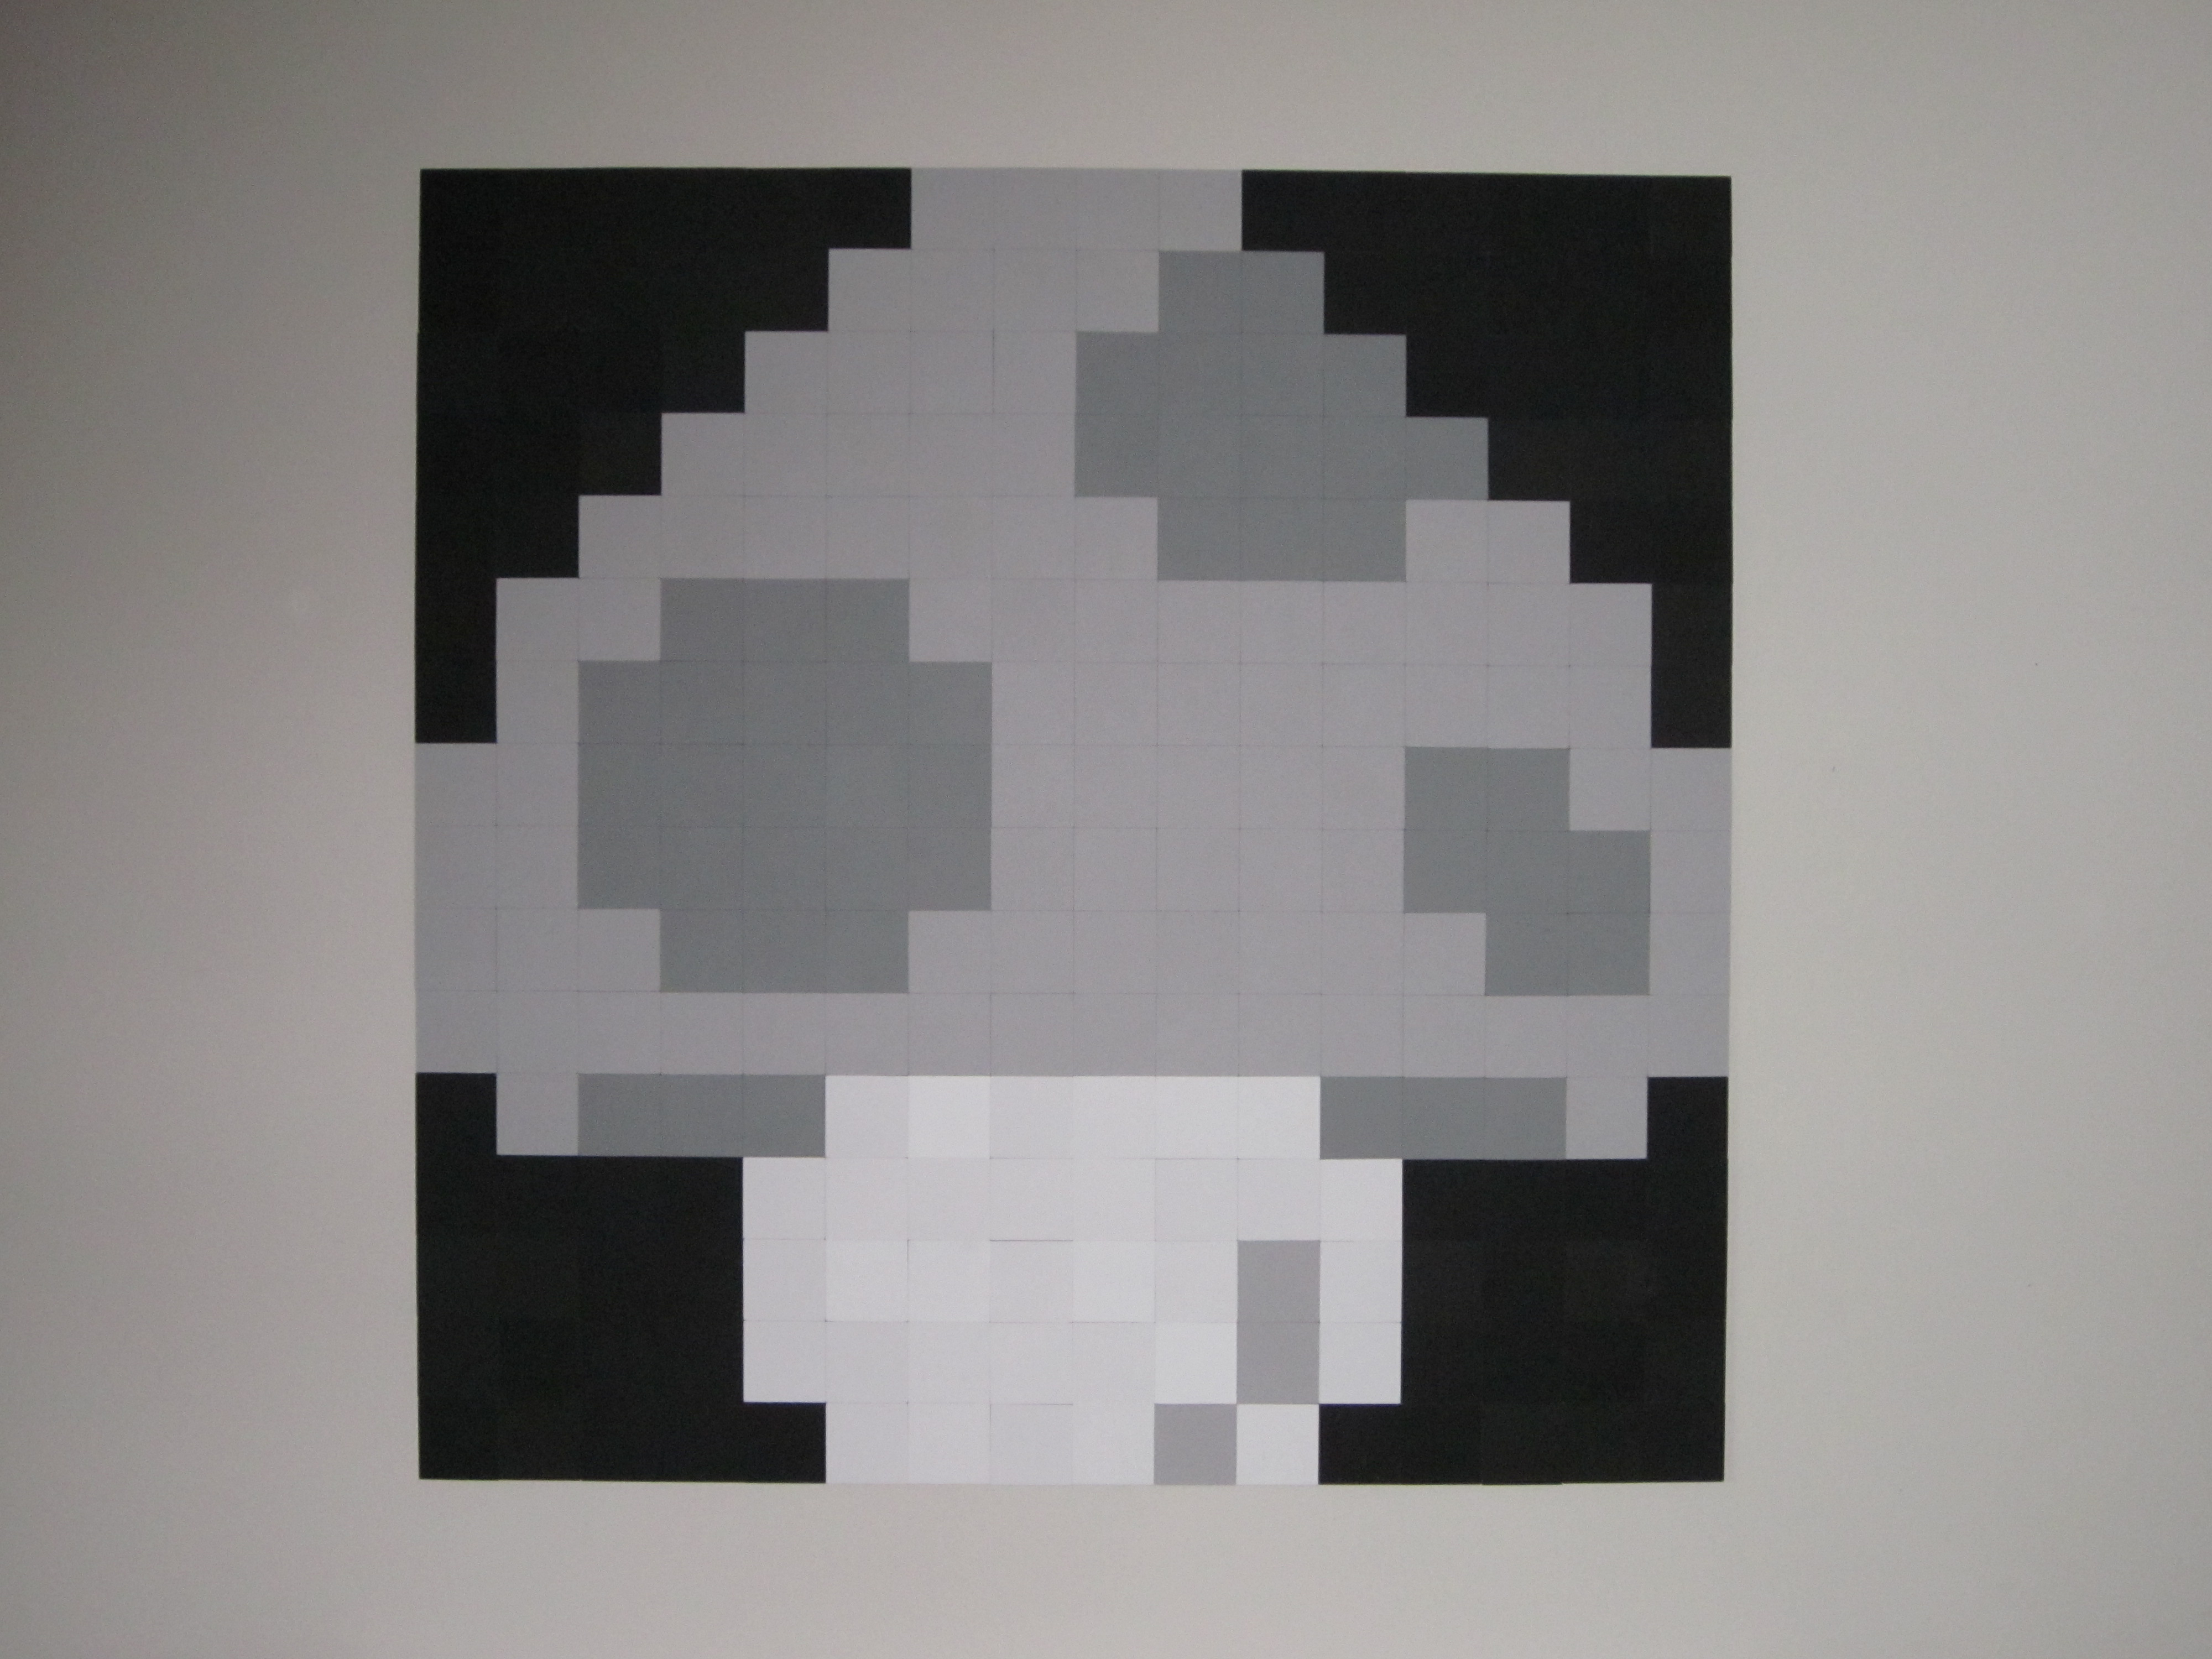 8 Bit Art Super Mushroom 8 Bit Living